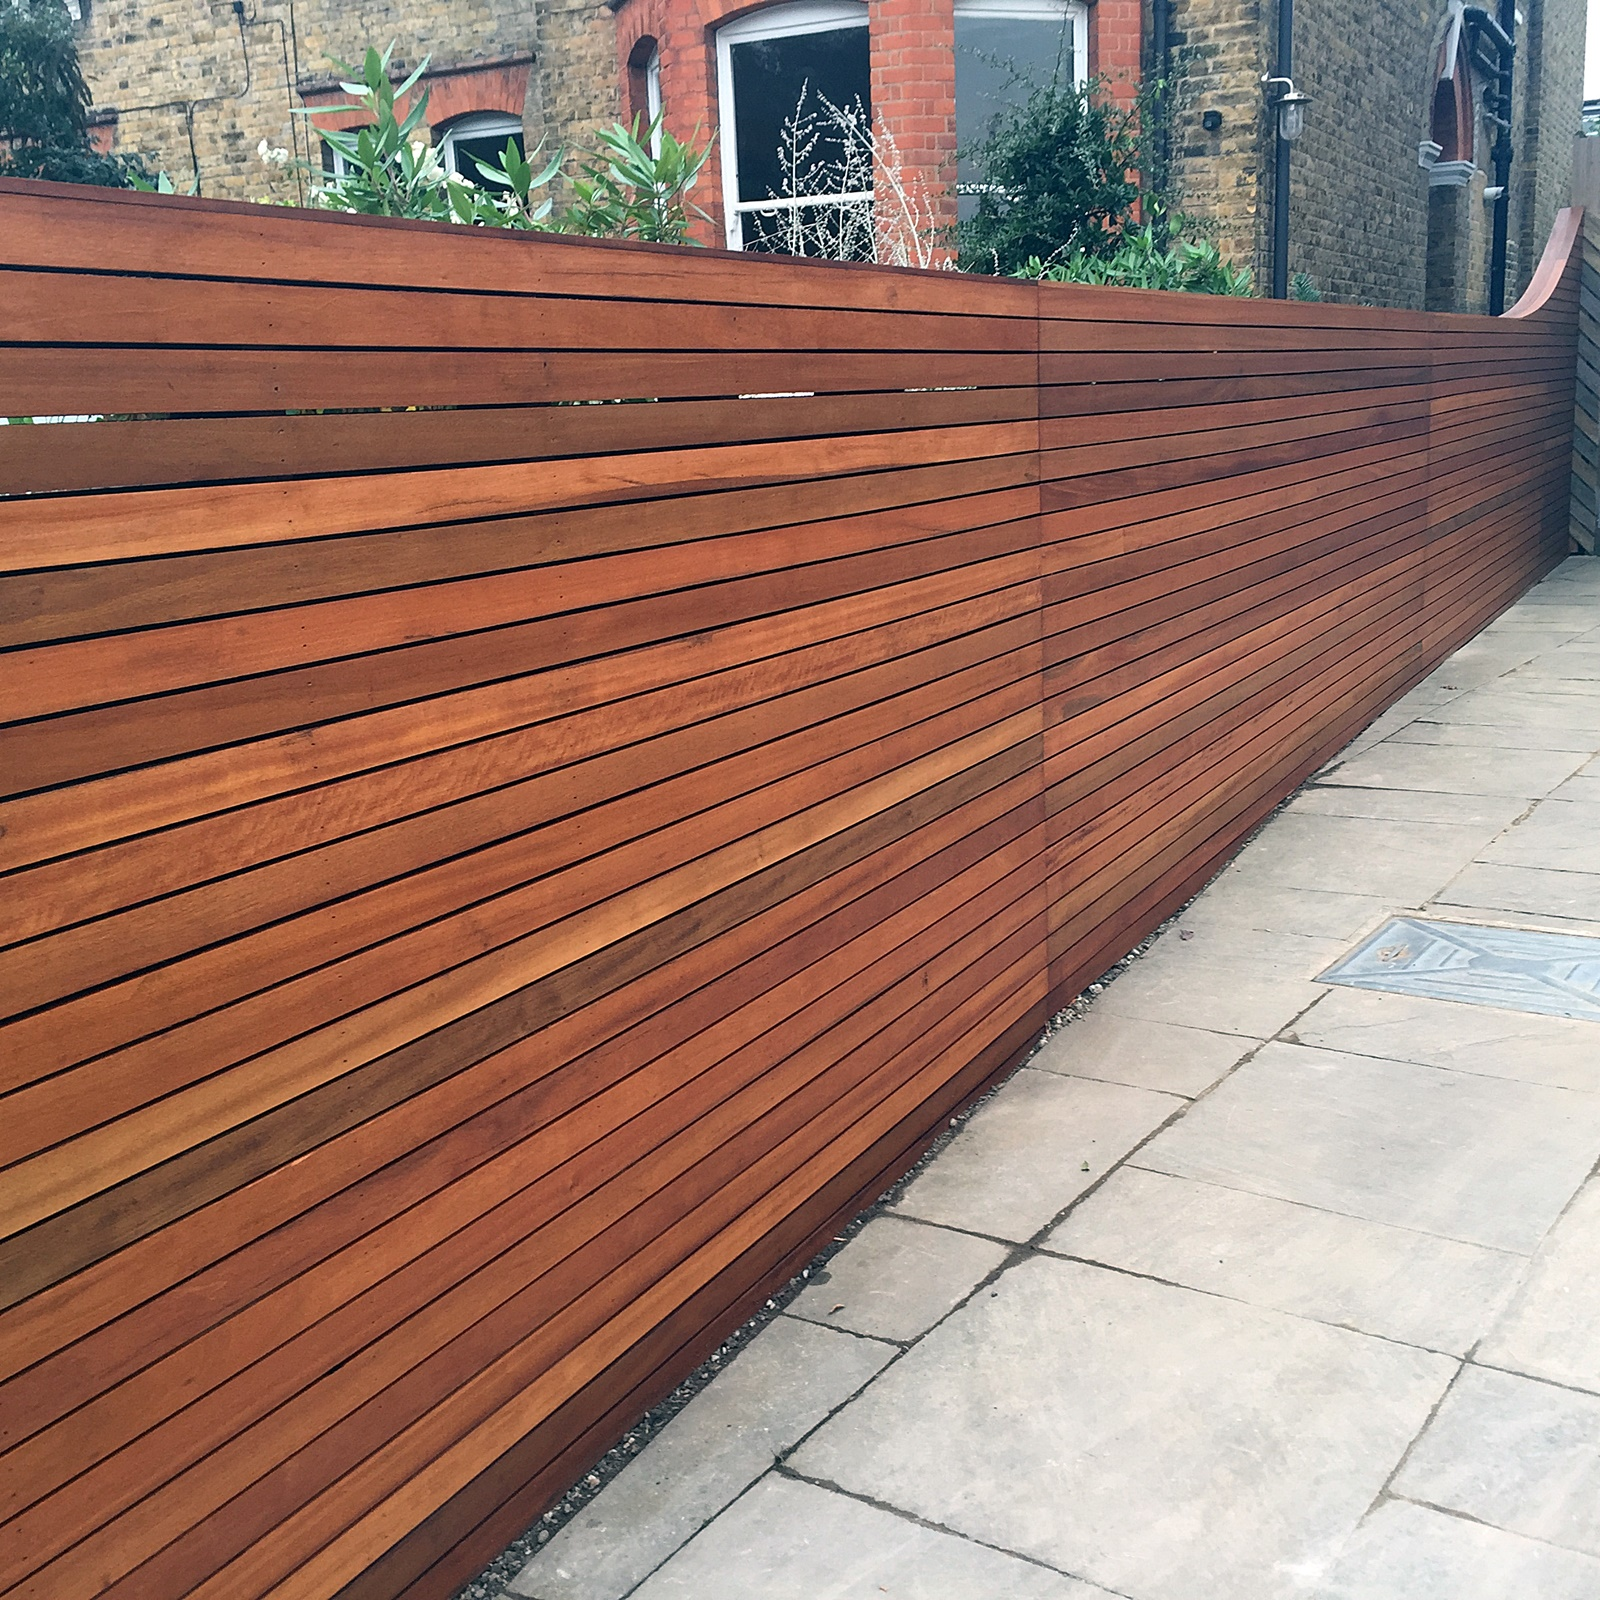 hardwood fence balau cedar trellis screen horizontal bespoke slats curved mayfair w1 westminister sw1 pimlico fulham chelsea sw3 dulwich london